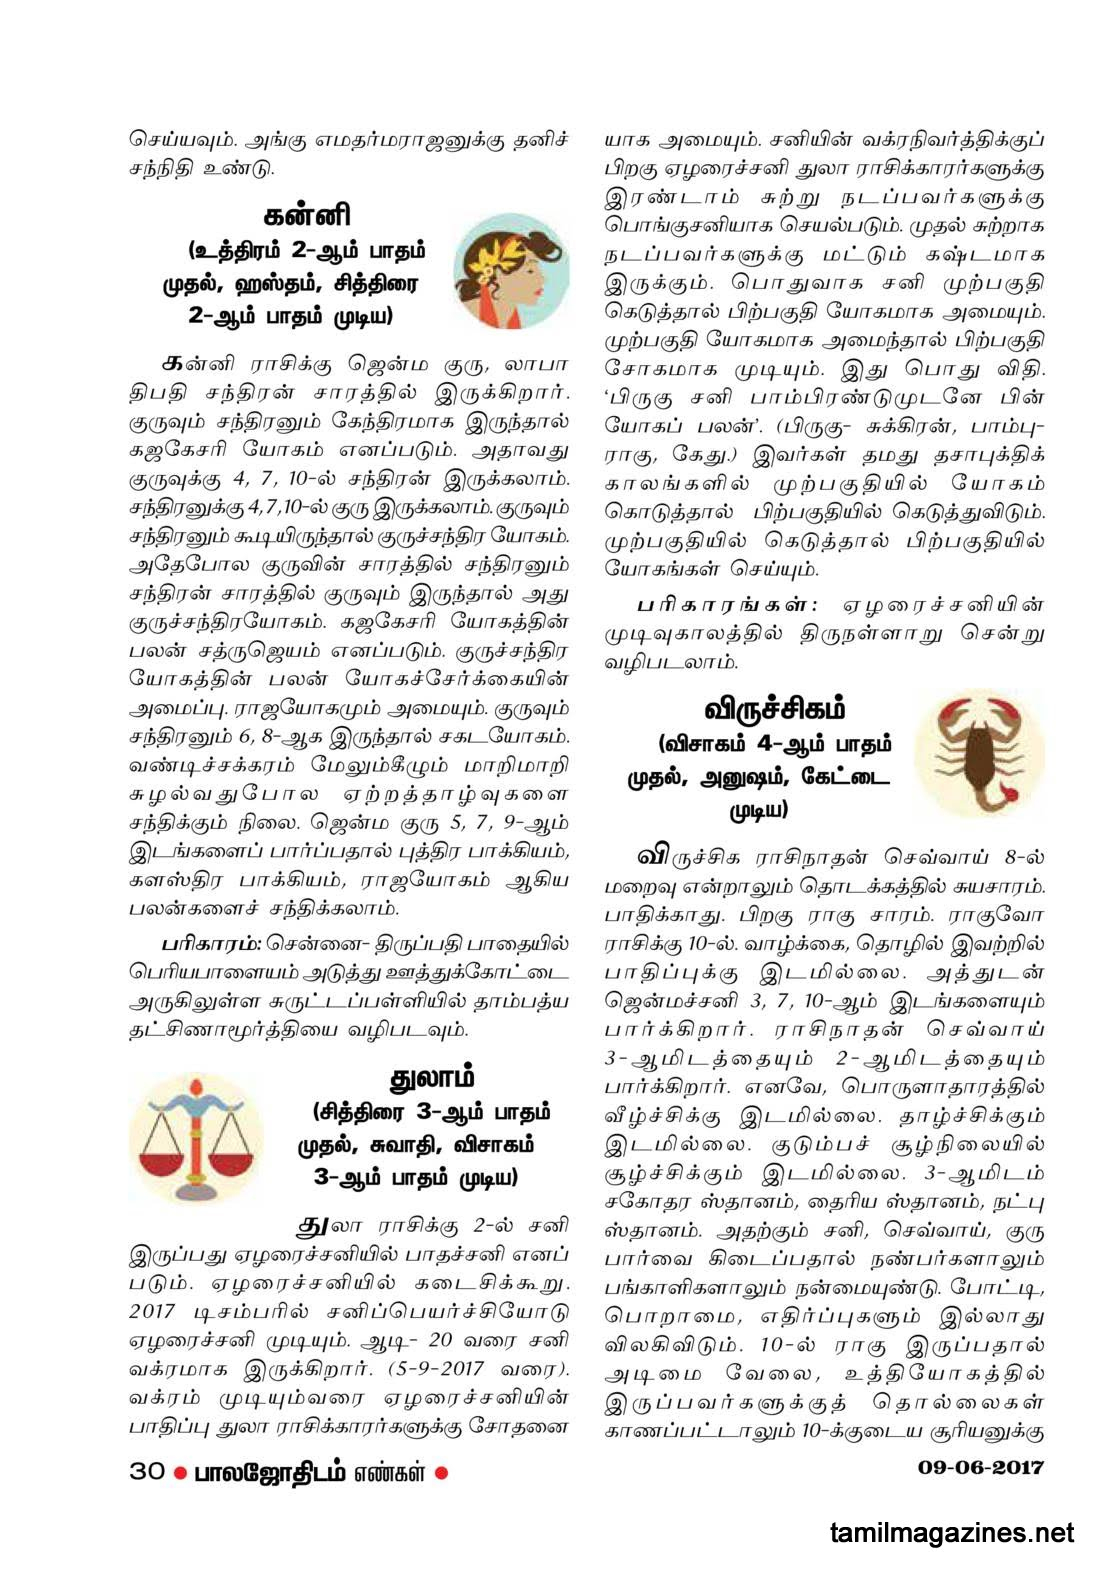 Balajothidam Raasi Palan June 6 to June 12, 2017